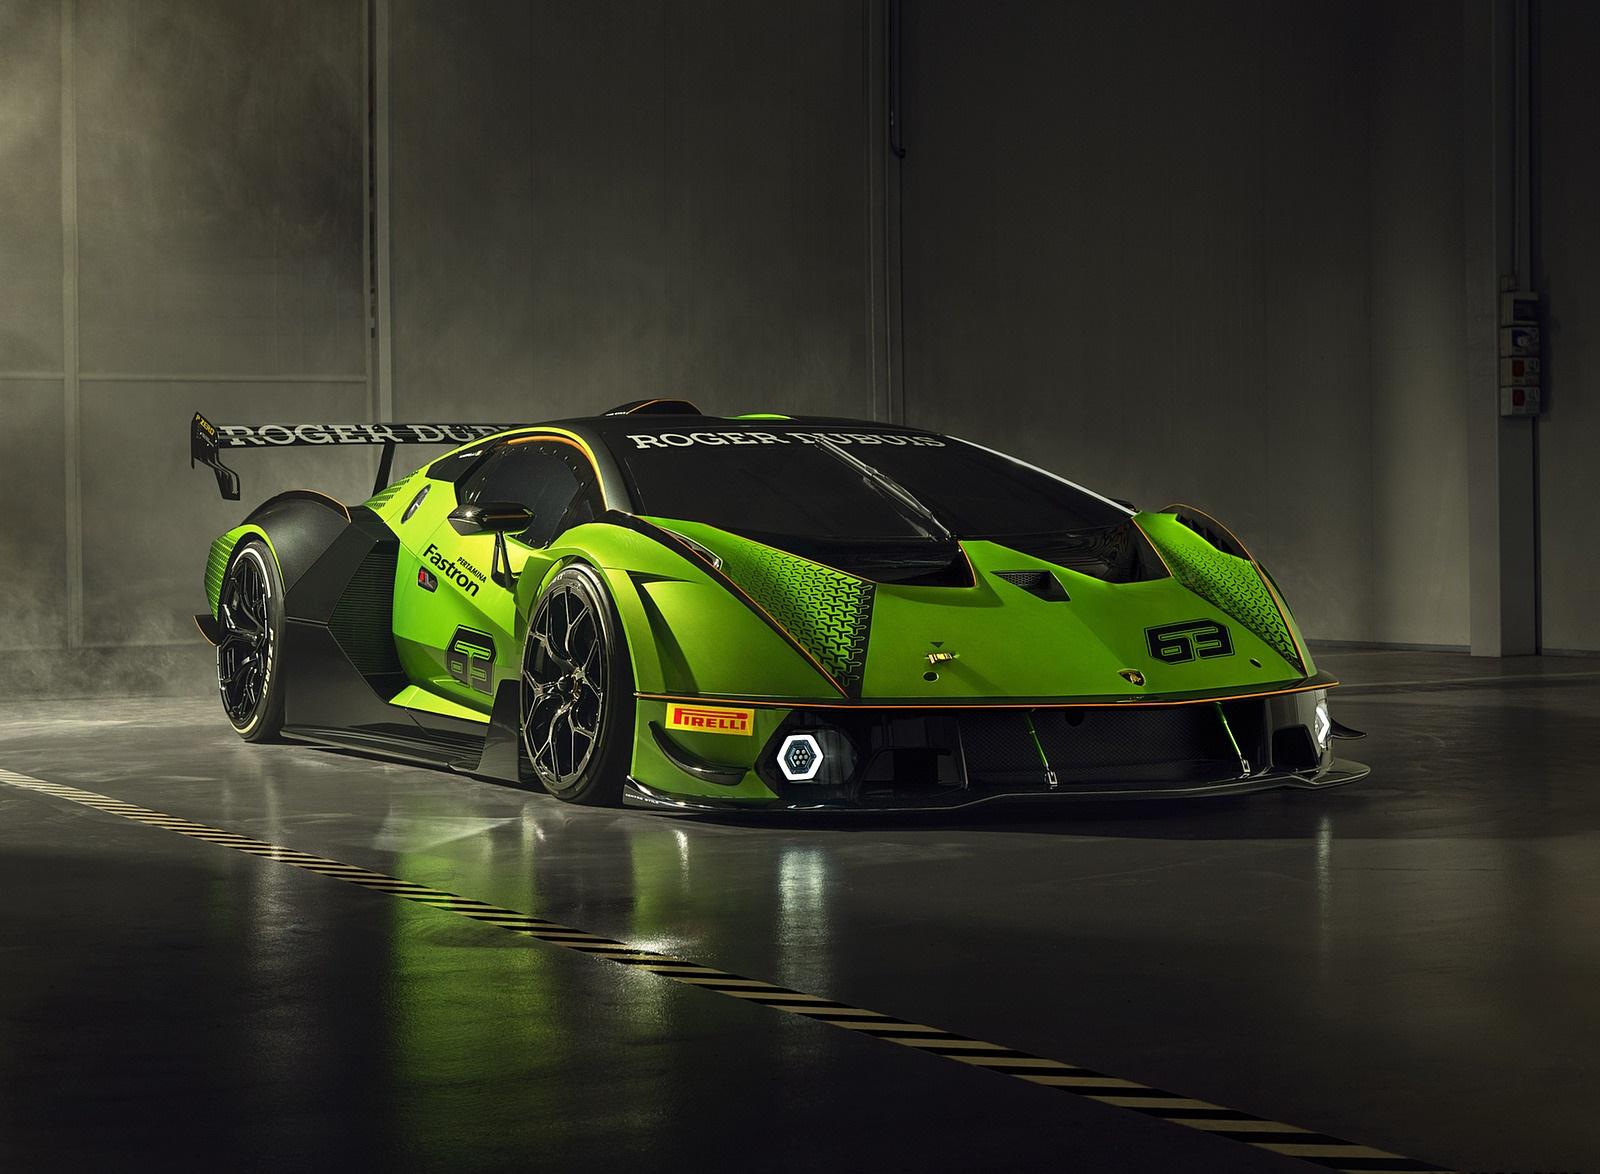 2021 Lamborghini Essenza SCV12 Front Three-Quarter Wallpapers (1)